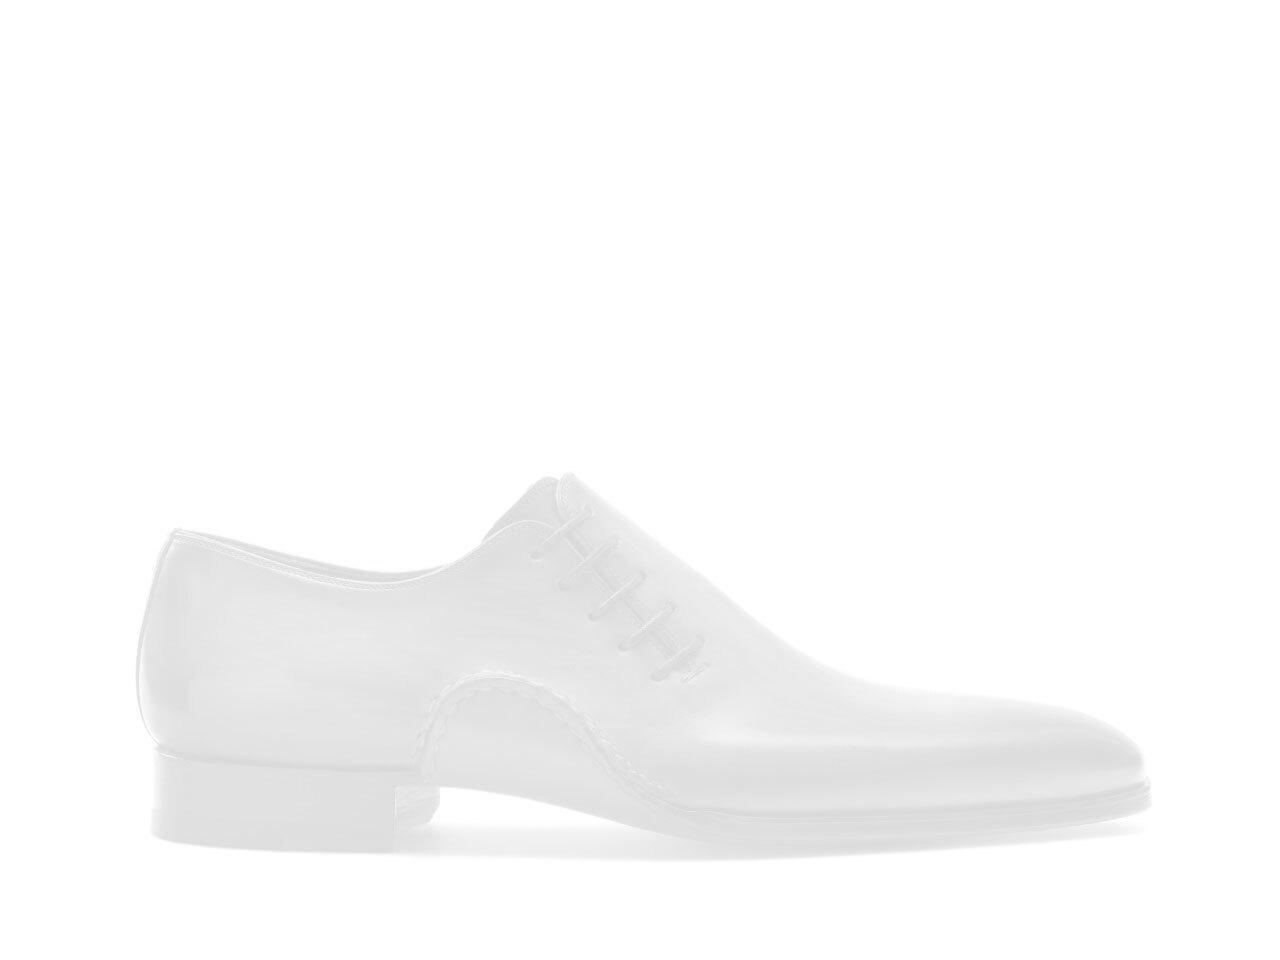 Pair of the Magnanni Spero Grey Men's Sneakers